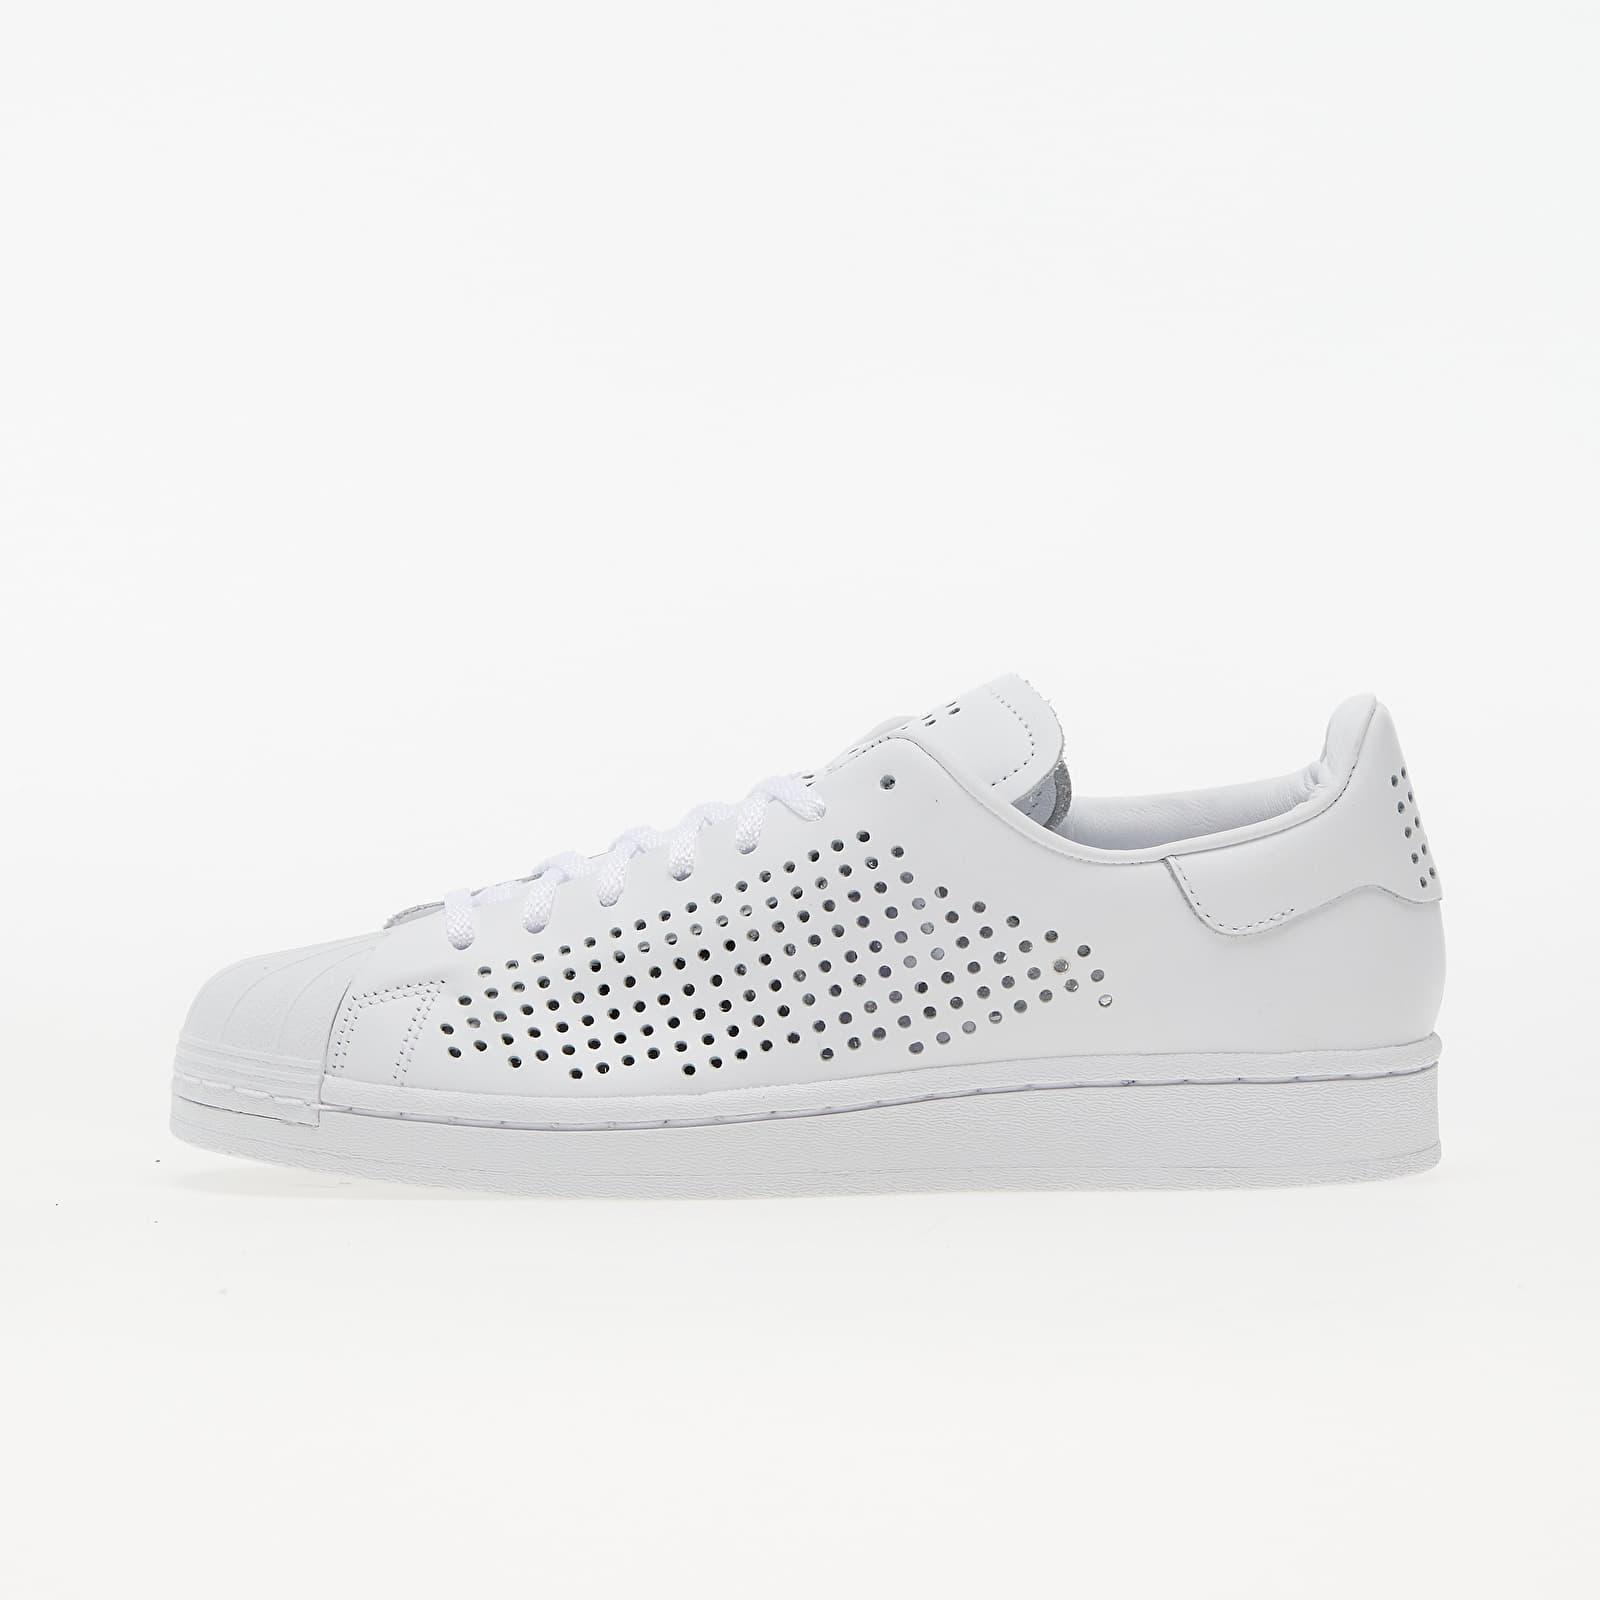 adidas Superstar Ftw White/ Ftw White/ Grey One EUR 41 1/3